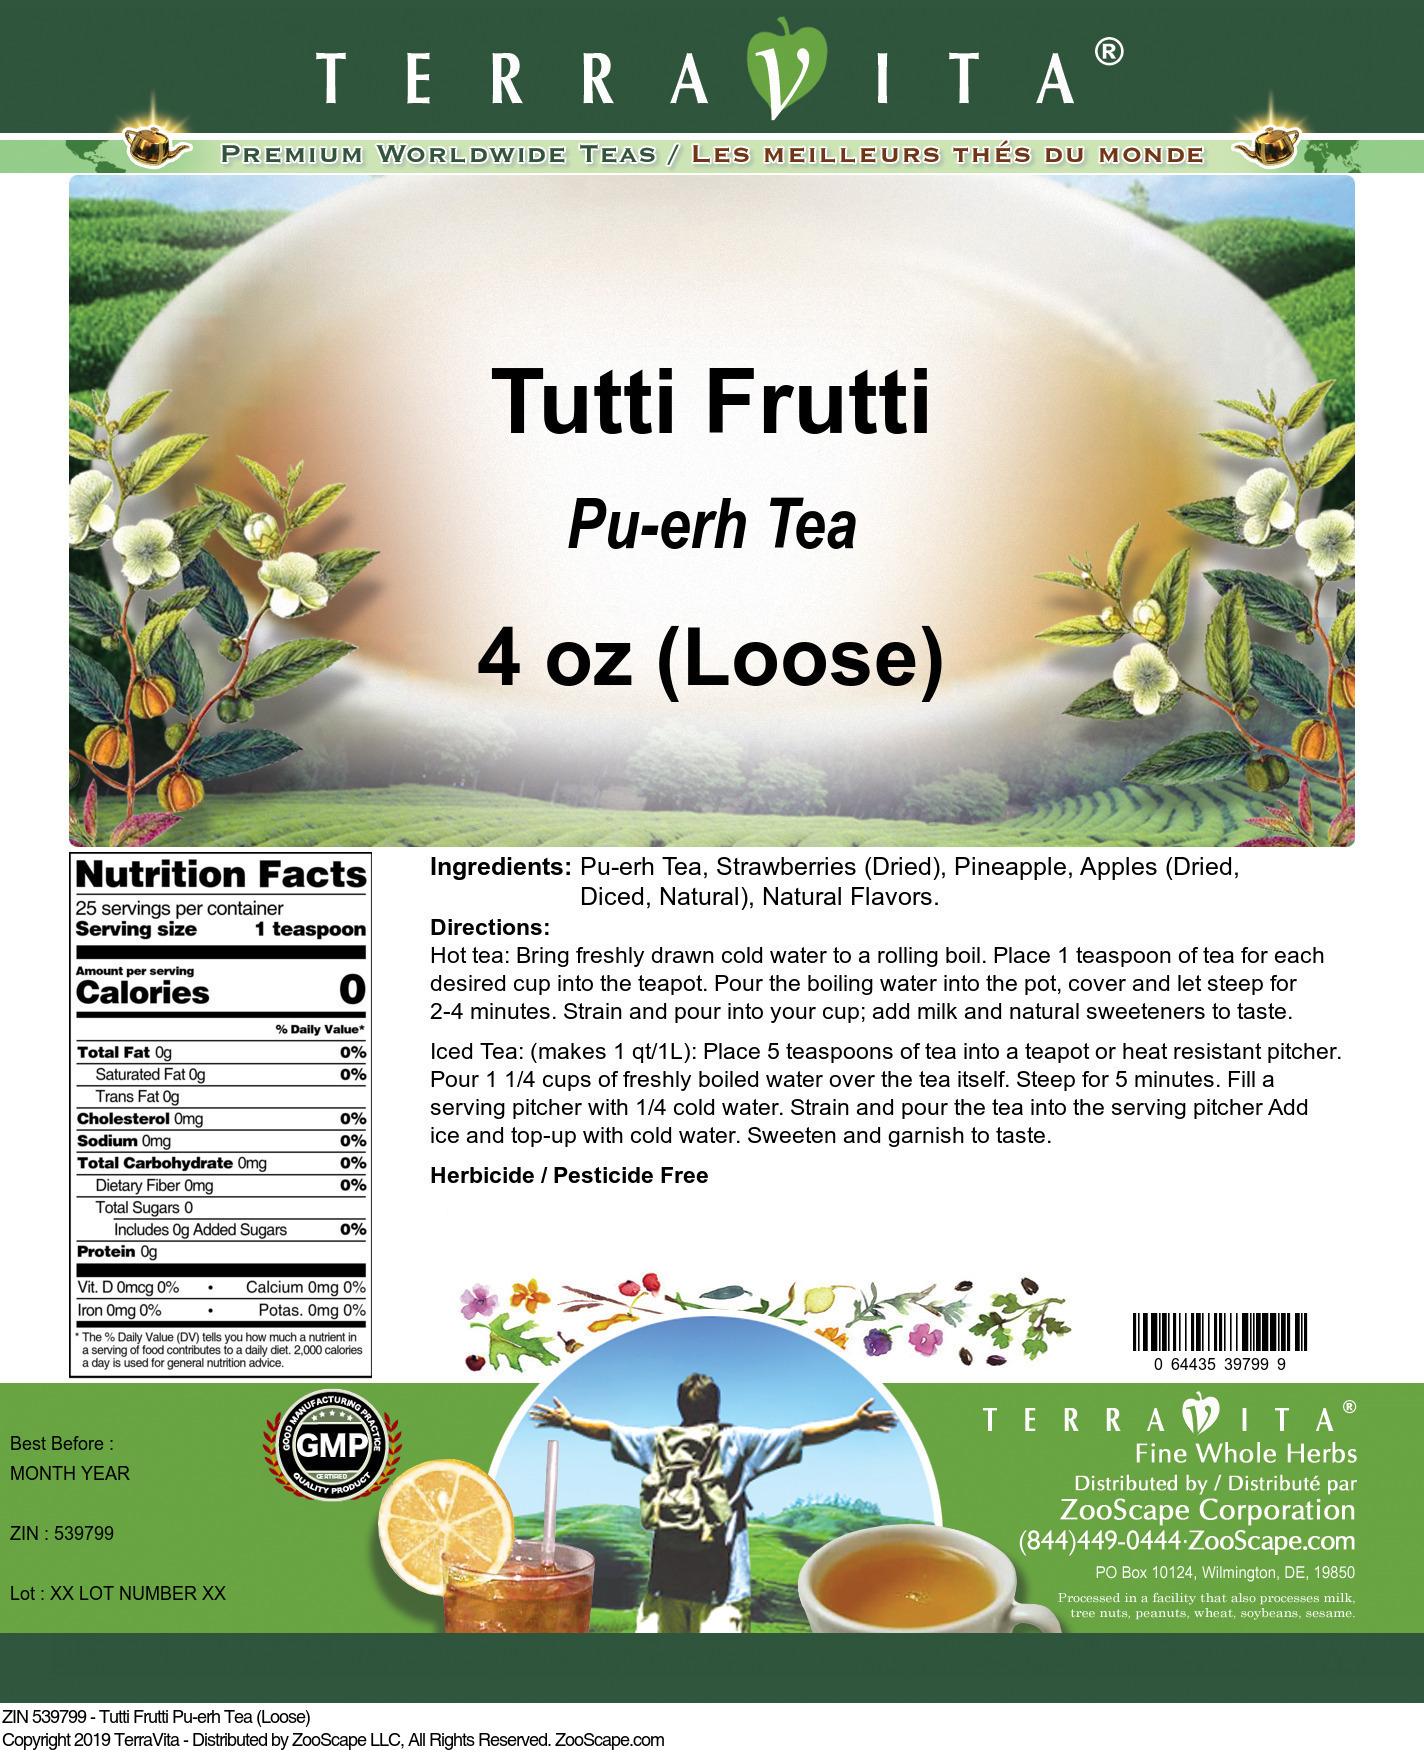 Tutti Frutti Pu-erh Tea (Loose)